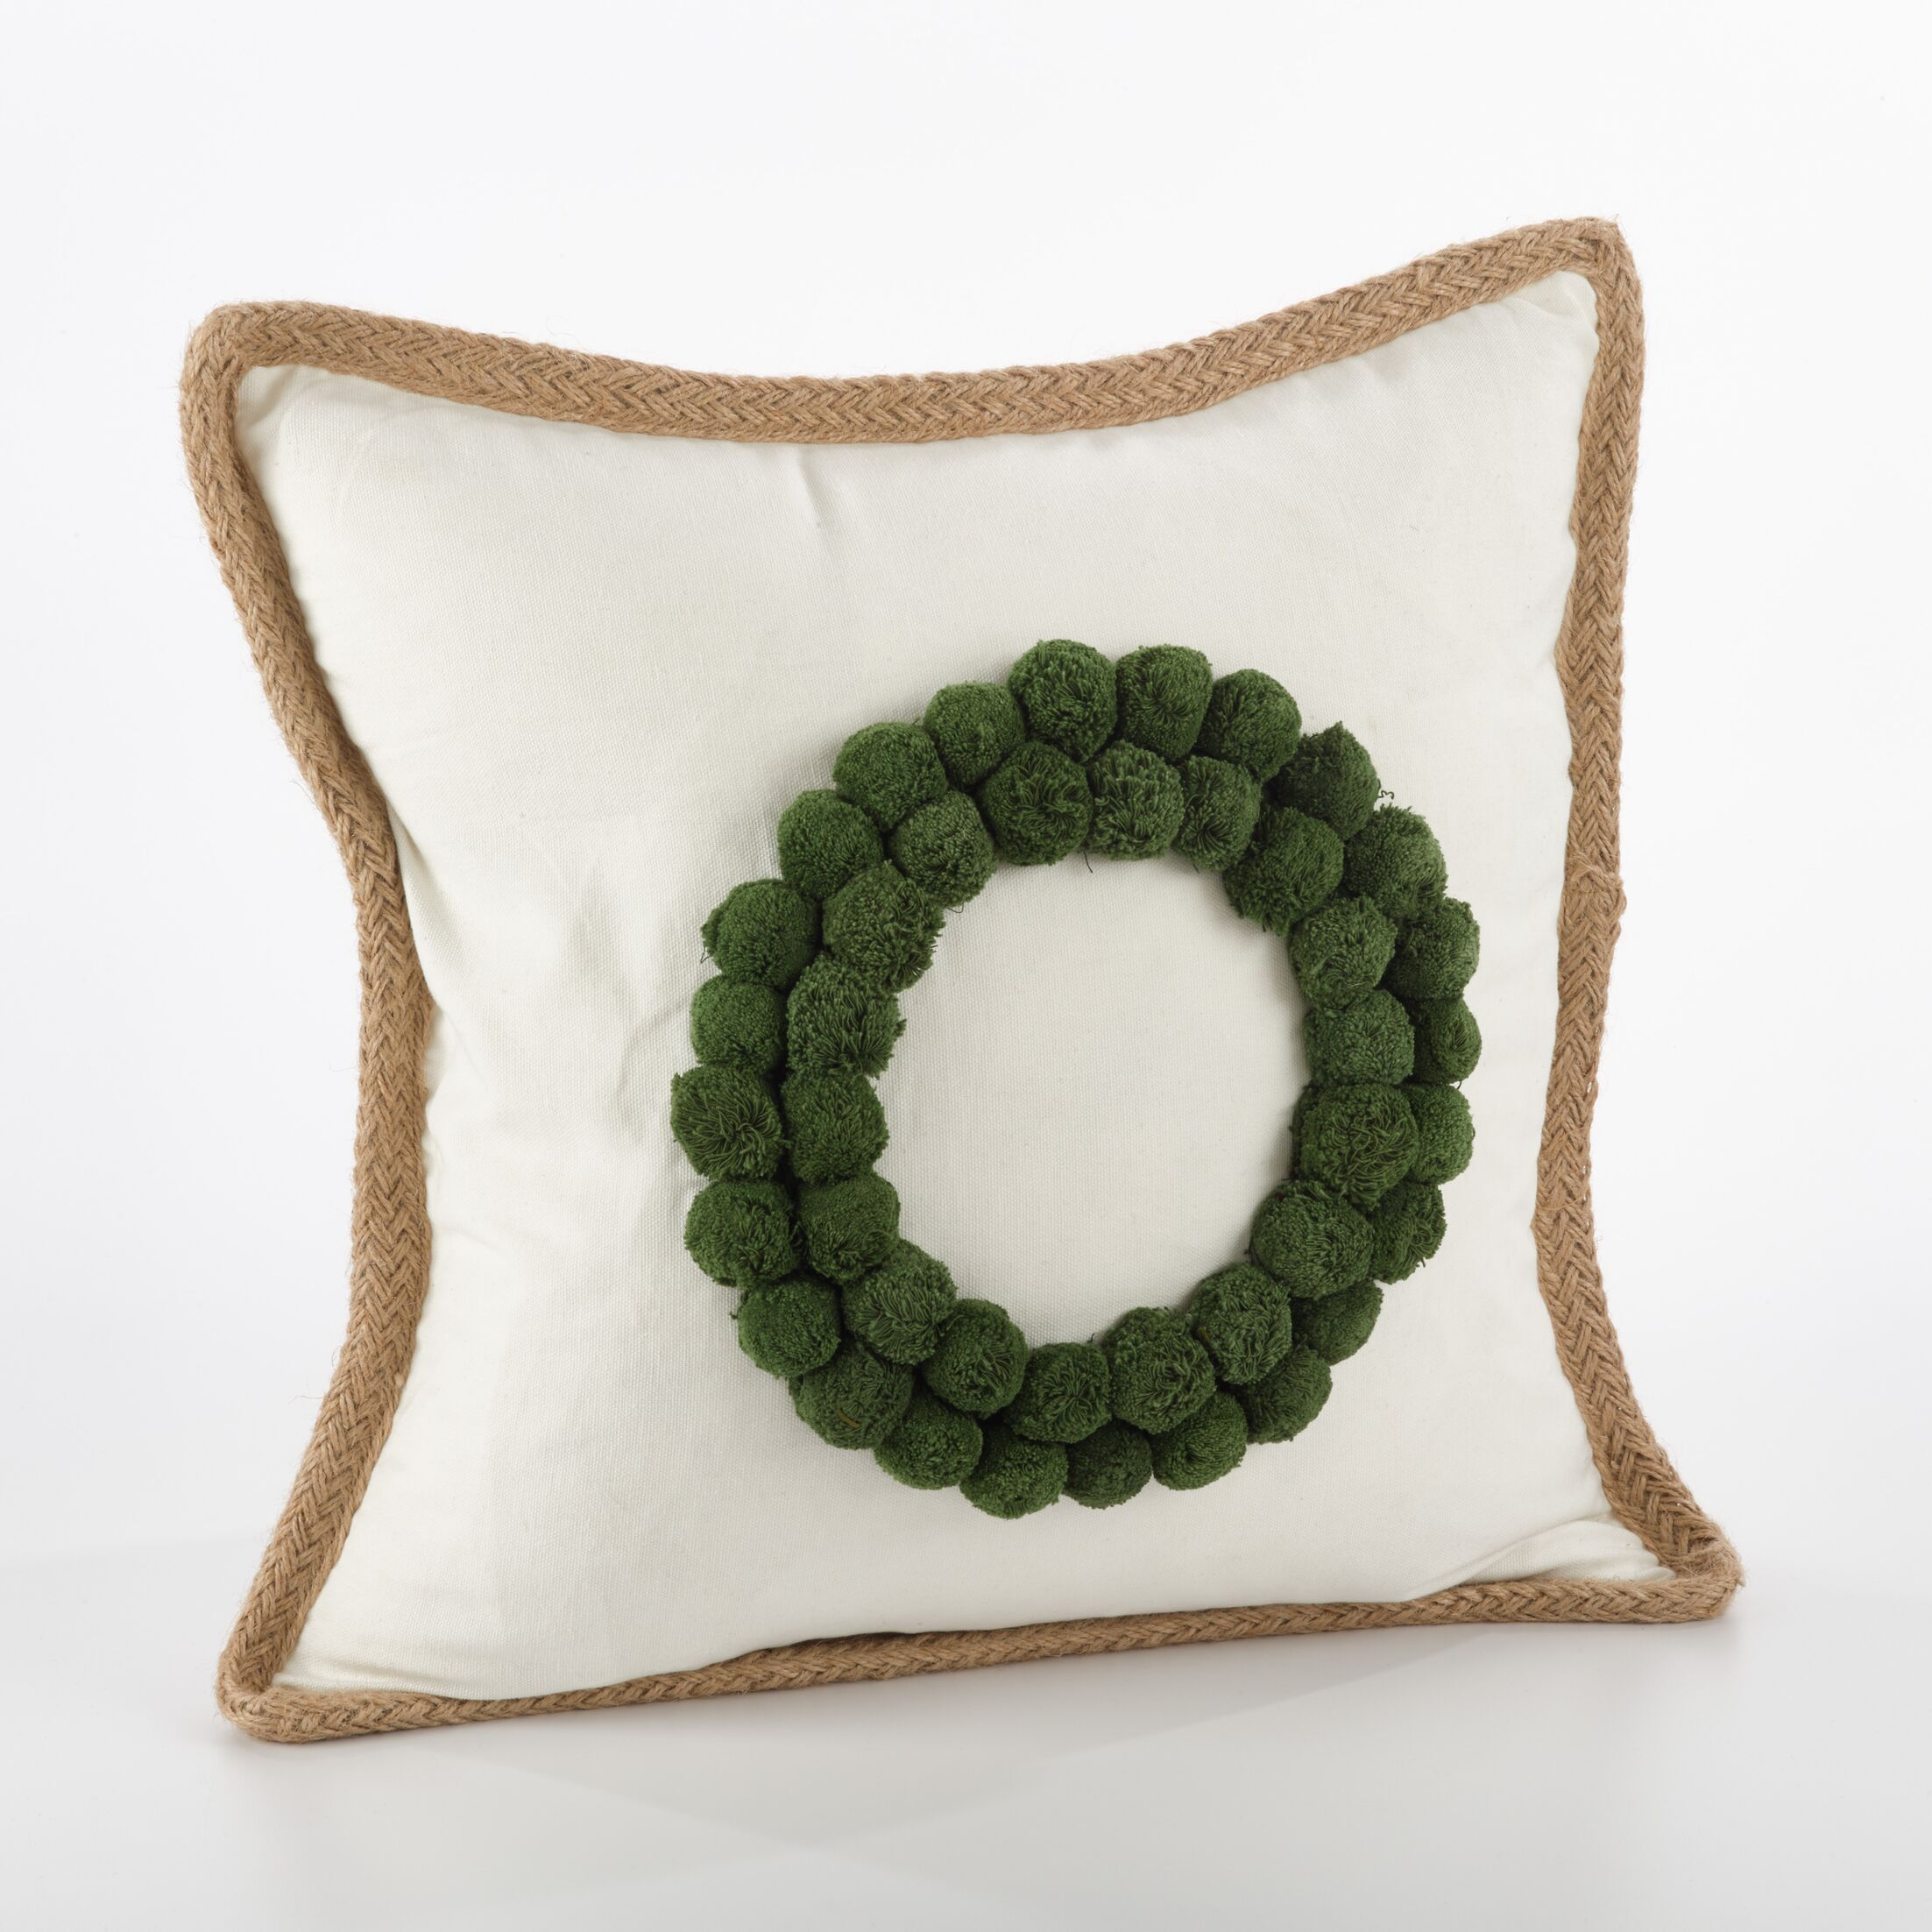 Ricamato Wreath Cotton Throw Pillow